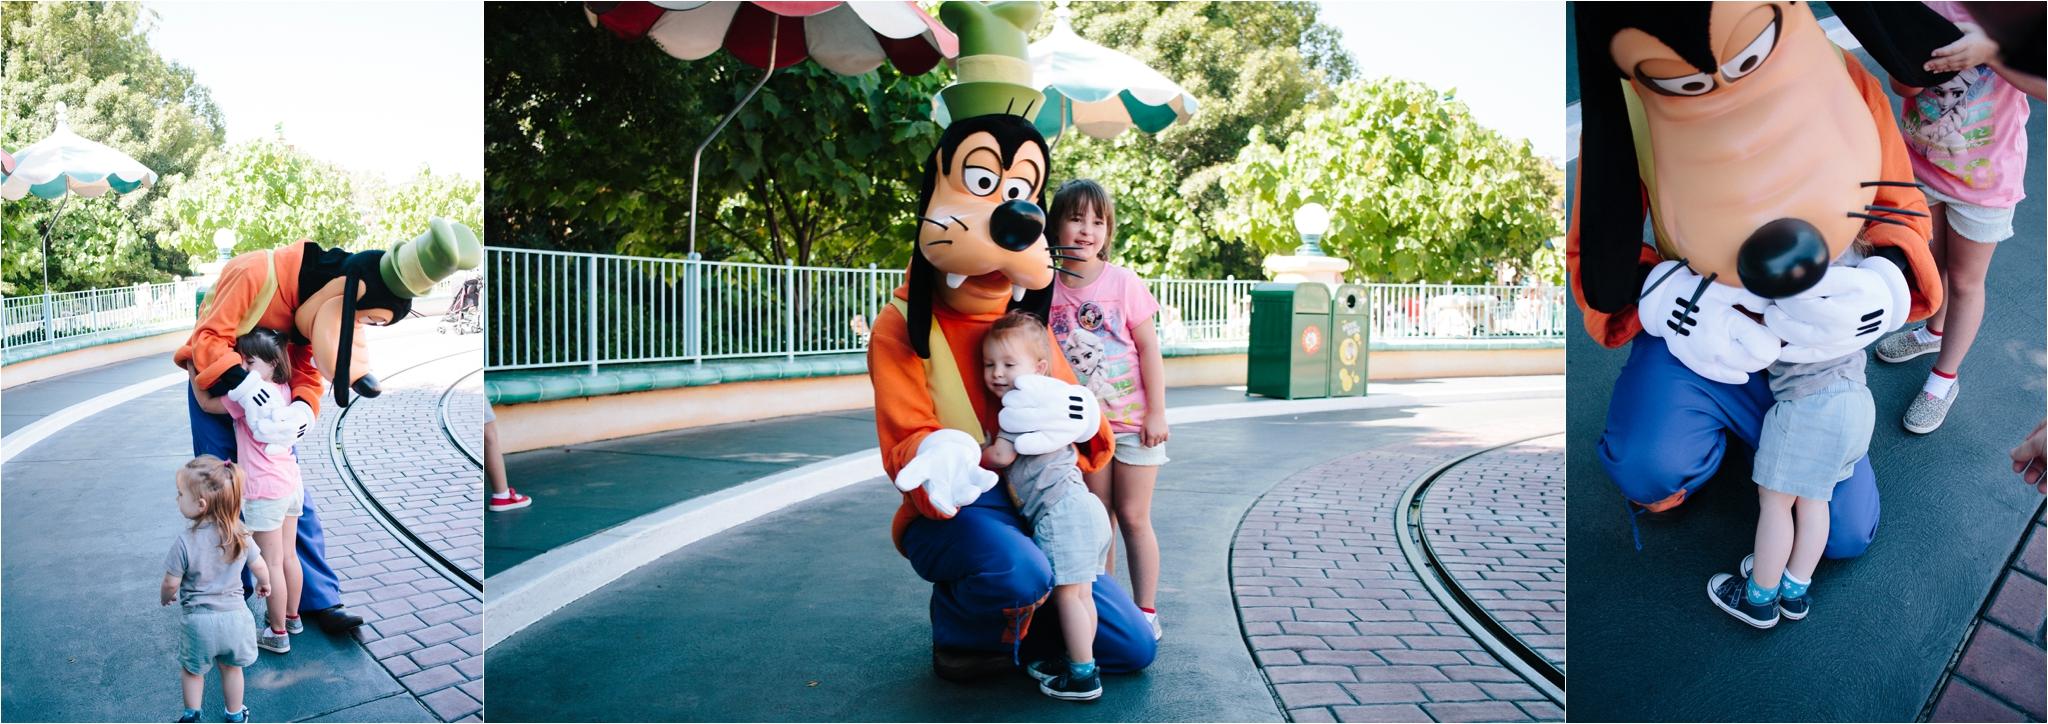 Disneylandroundtwopersonalimages_0013.jpg